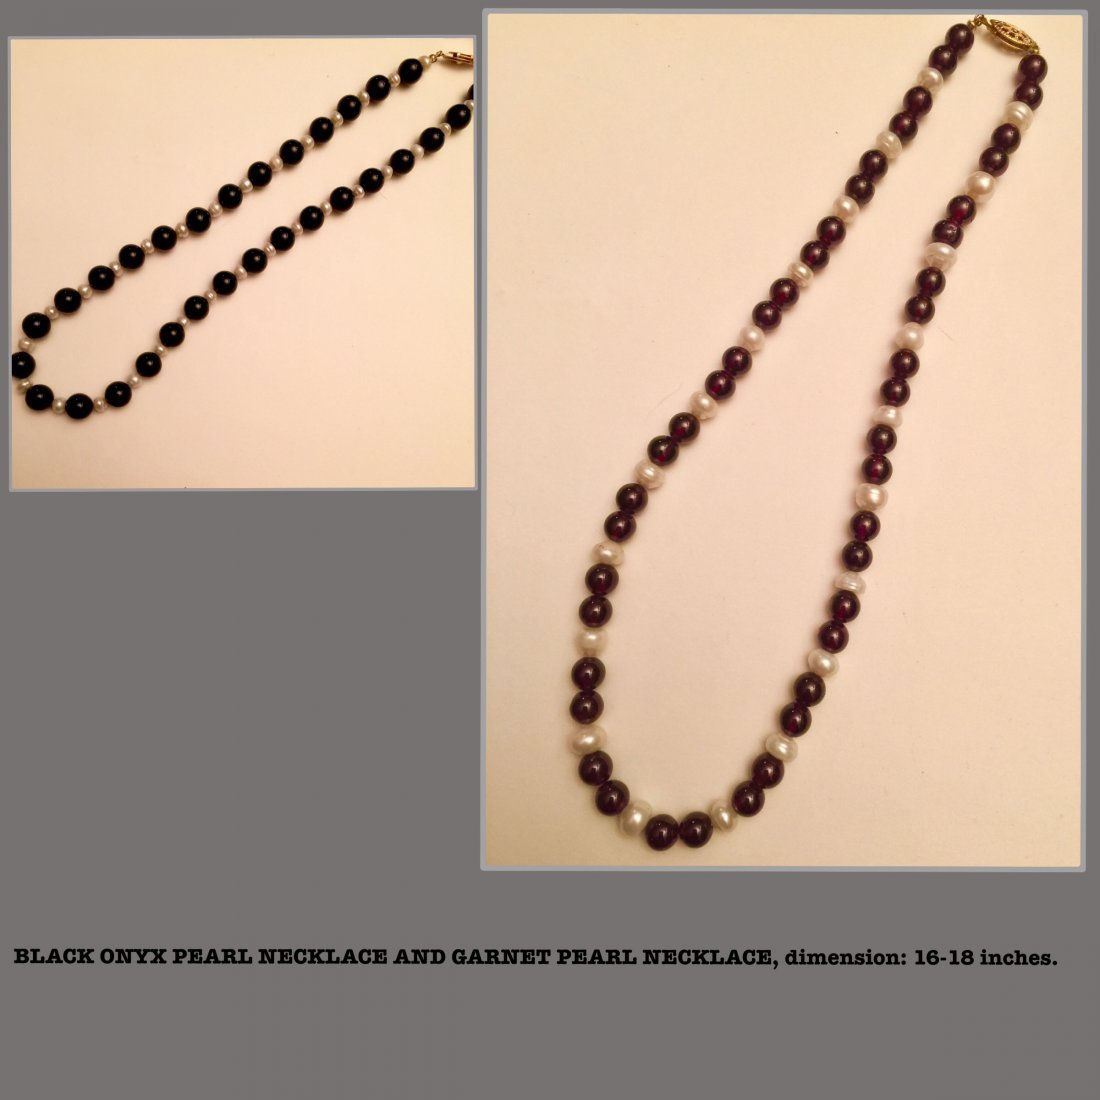 Black Onyx, FWP Necklace, 2 pieces Estate Jewelry